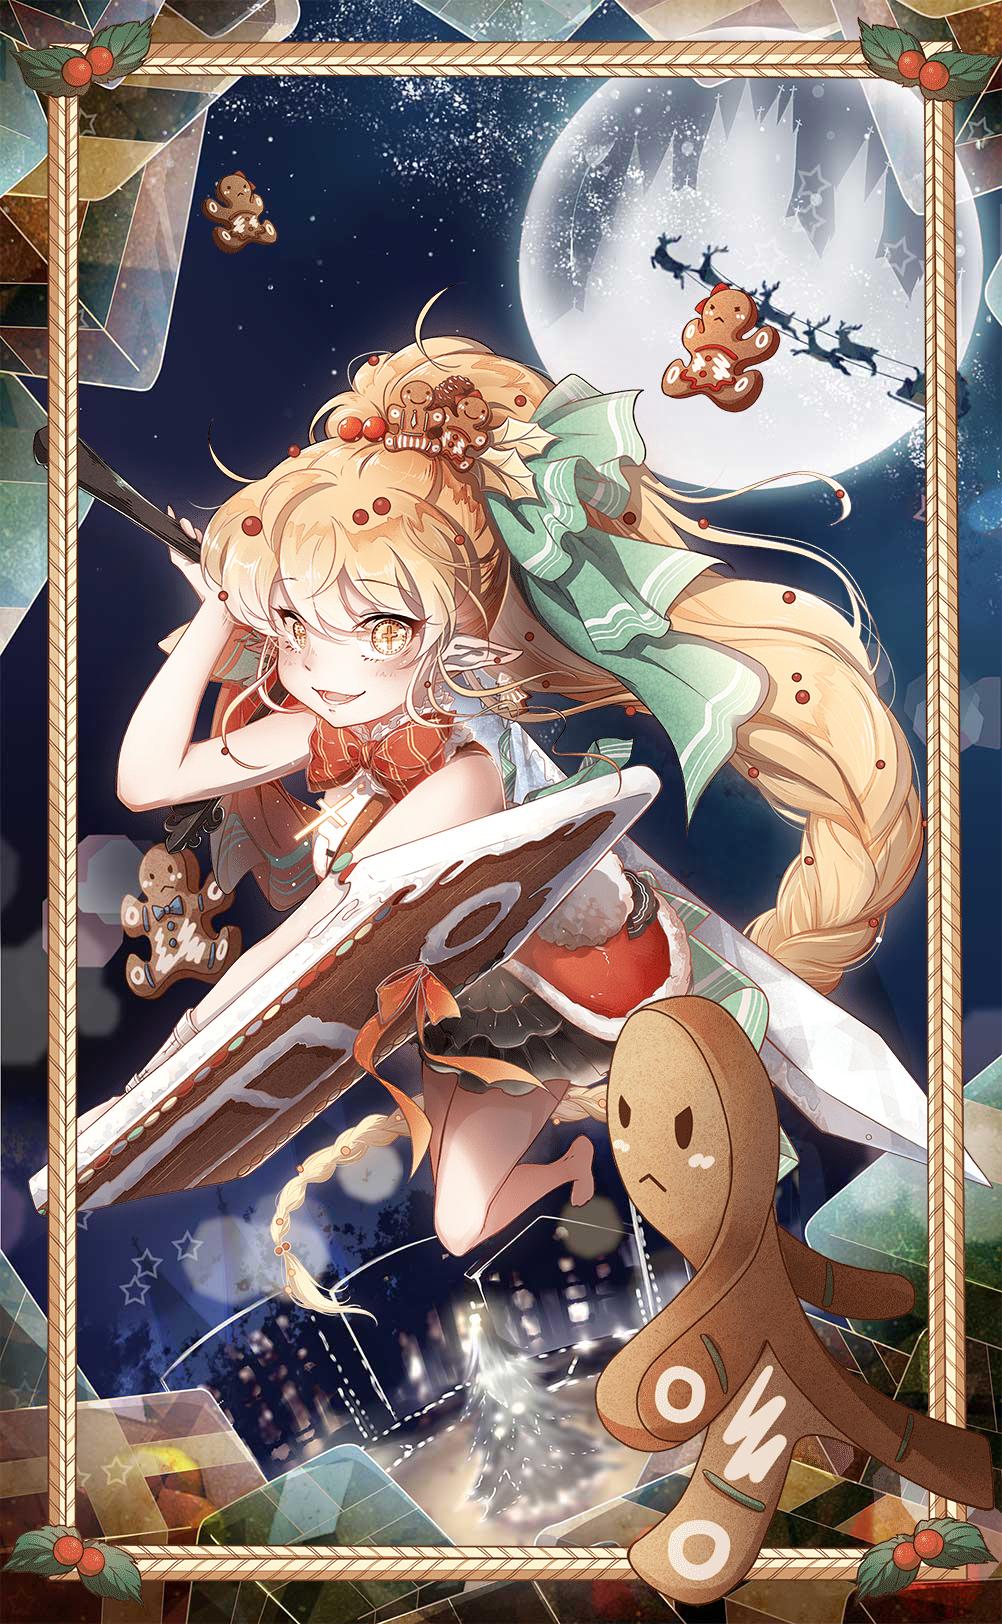 Gingerbread (Food Fantasy) Image #2401346 - Zerochan Anime